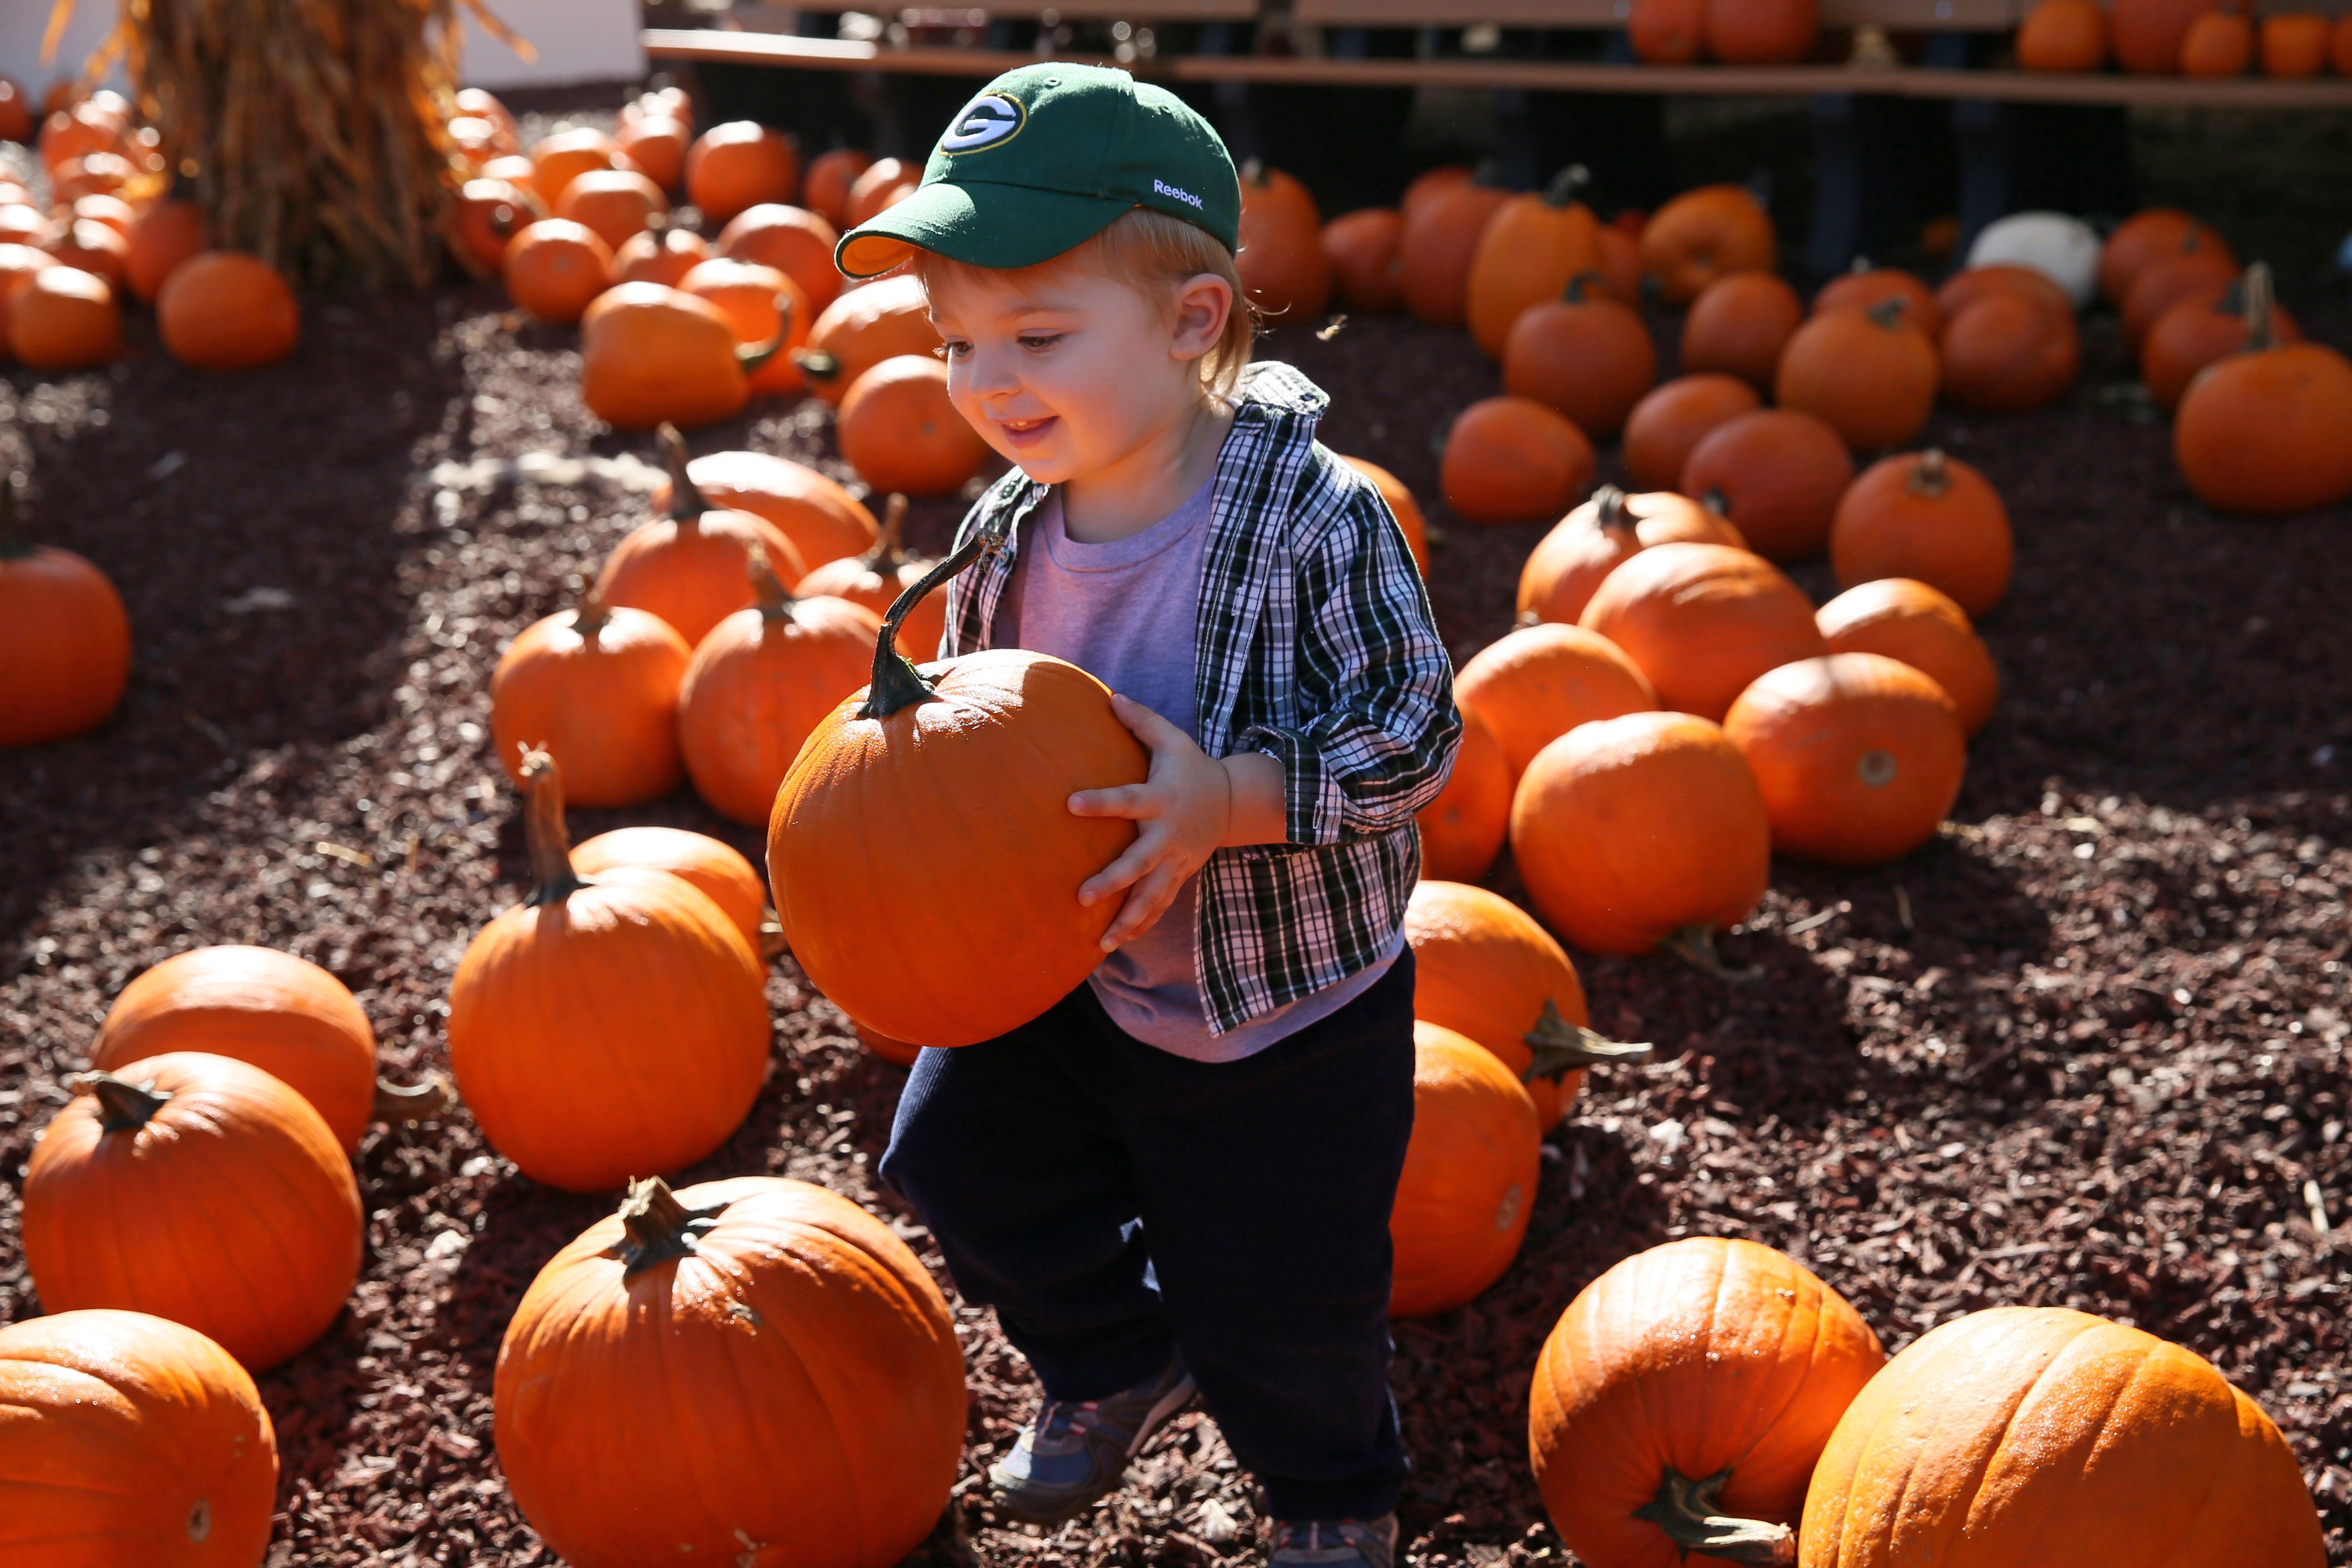 Pumpkins, pumpkins everywhere at Harvest Fair at Wisconsin State Fair Park.